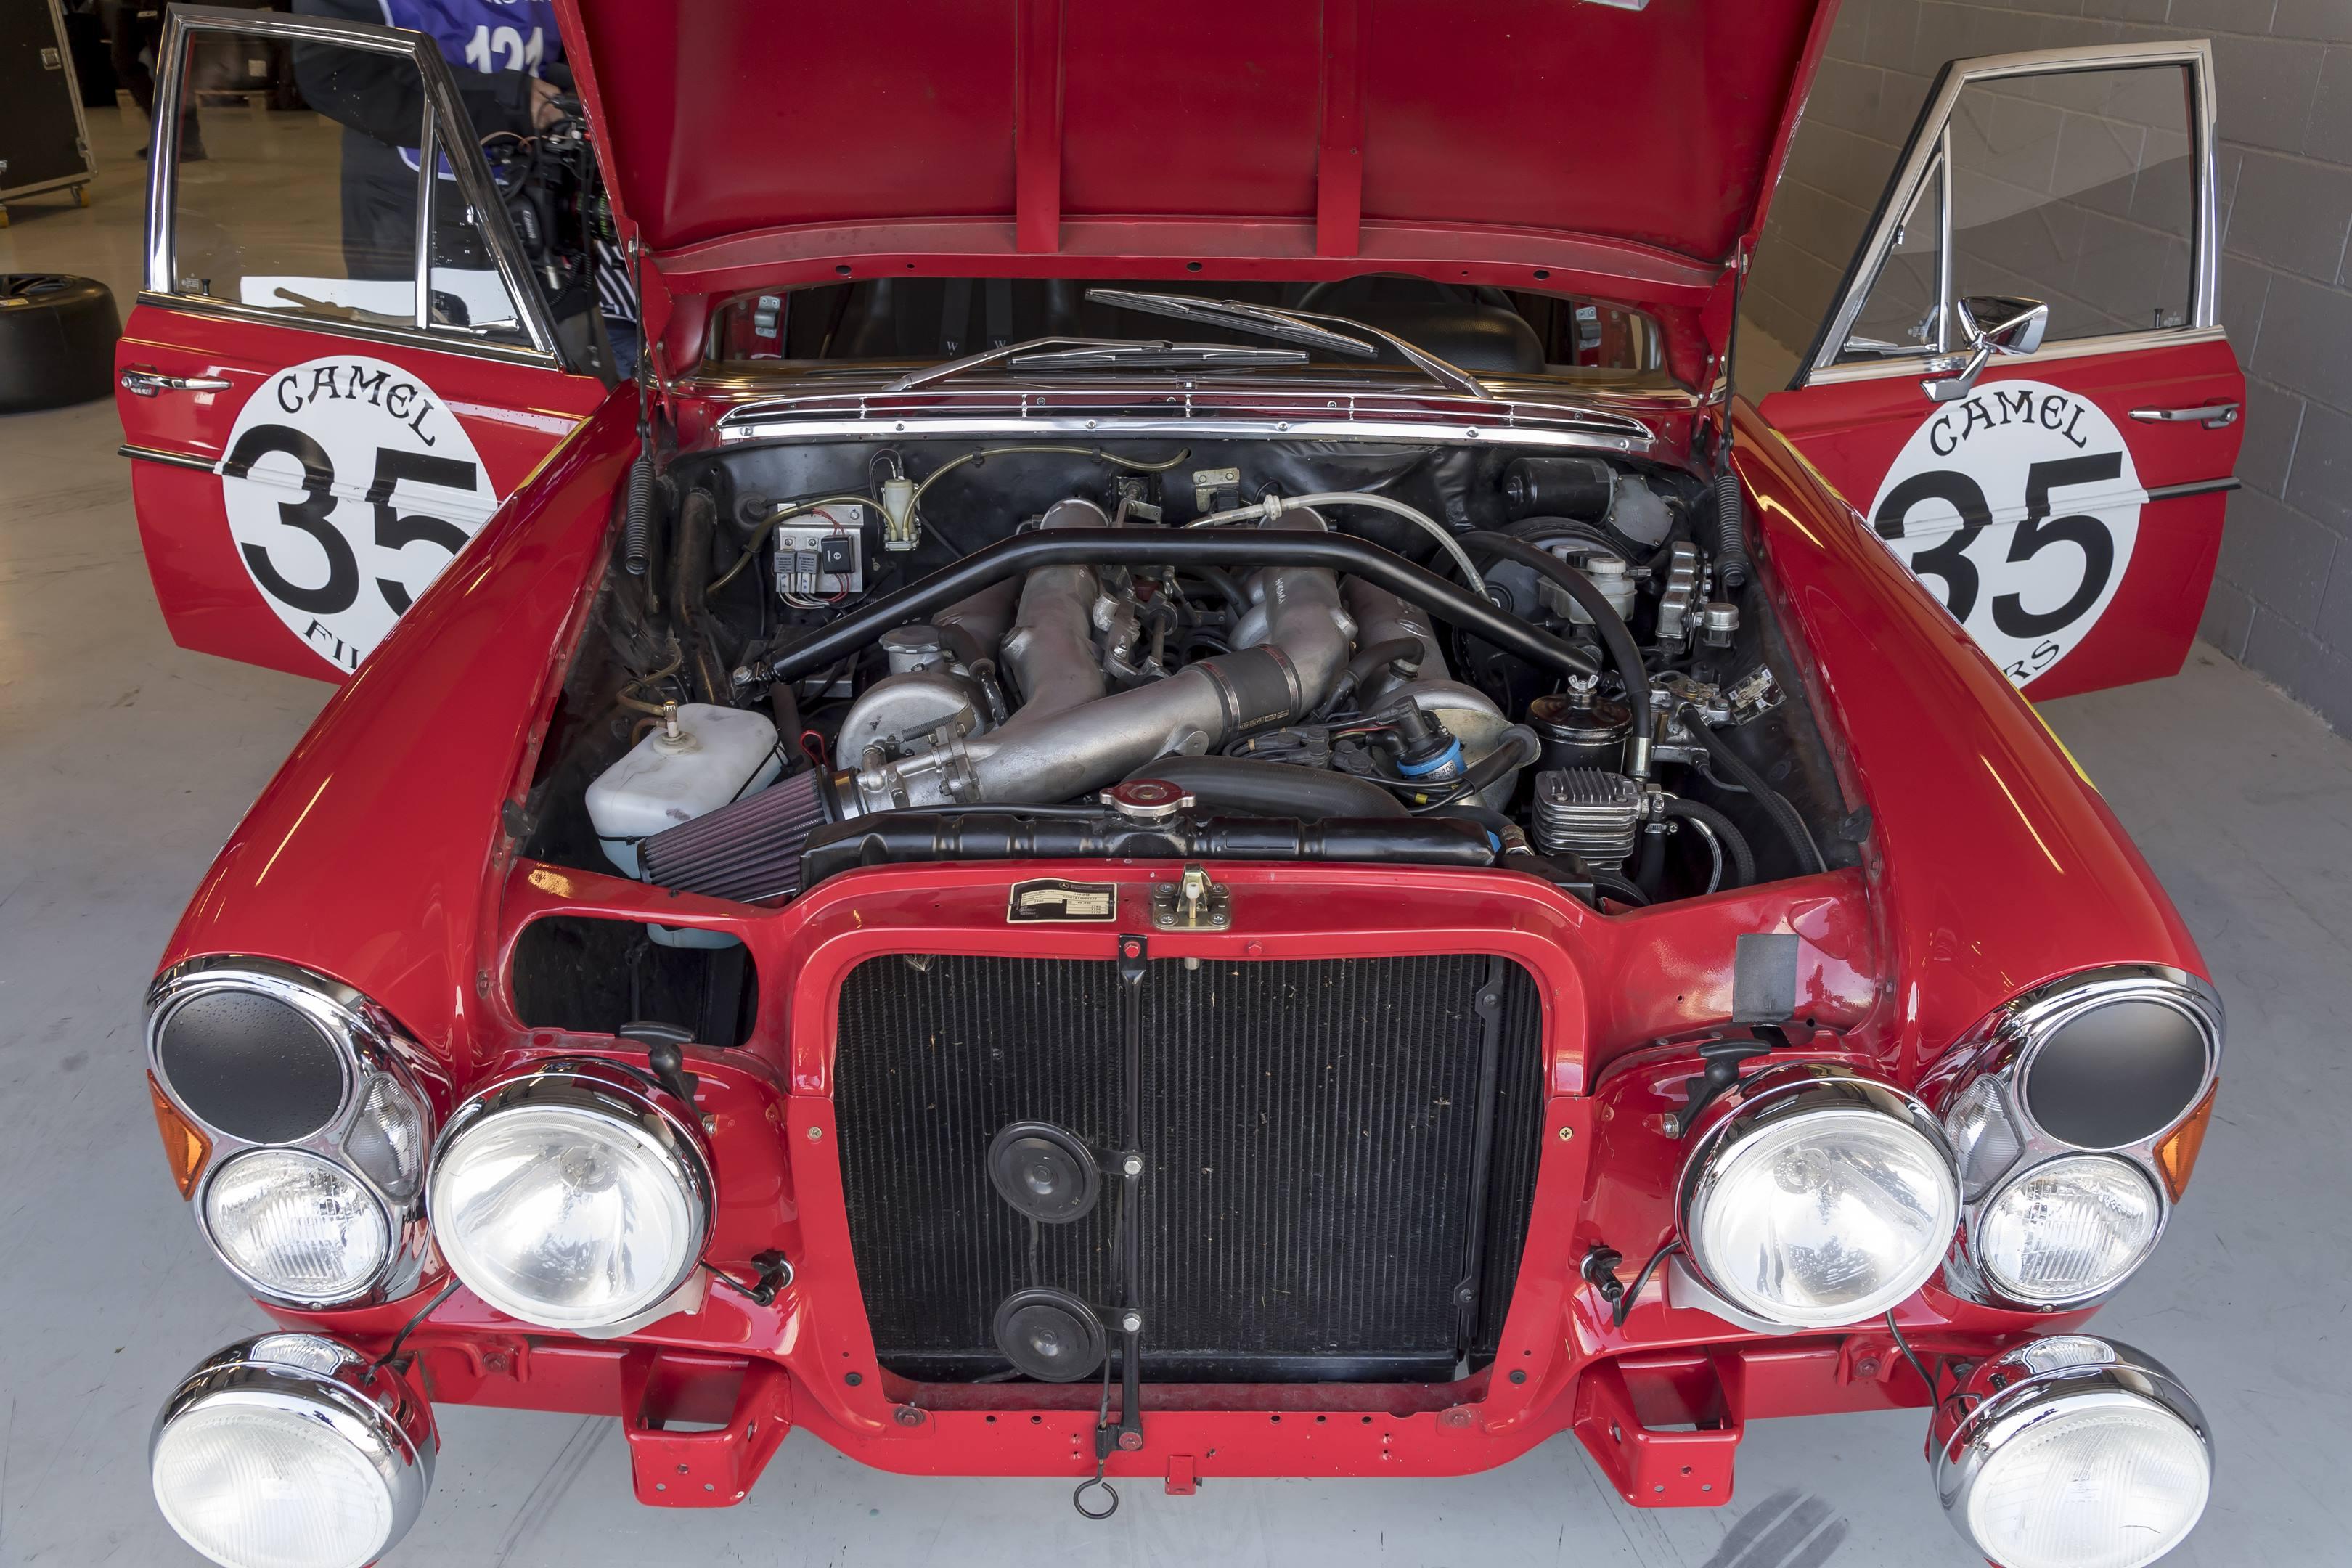 mercedes benz amg 300SEL 6.3 red pig engine